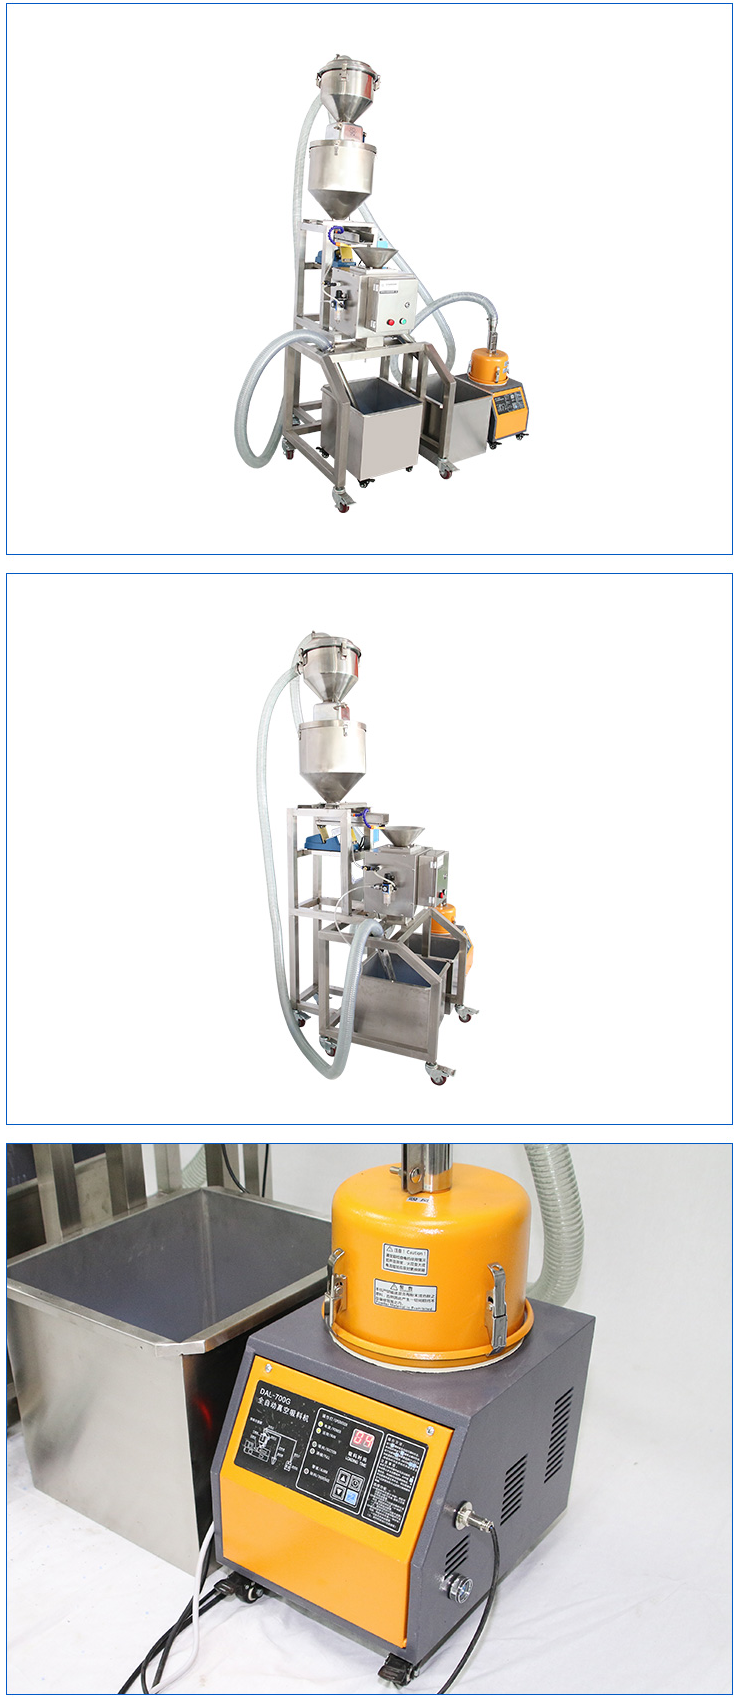 SAMD-700ZD3 metal separator